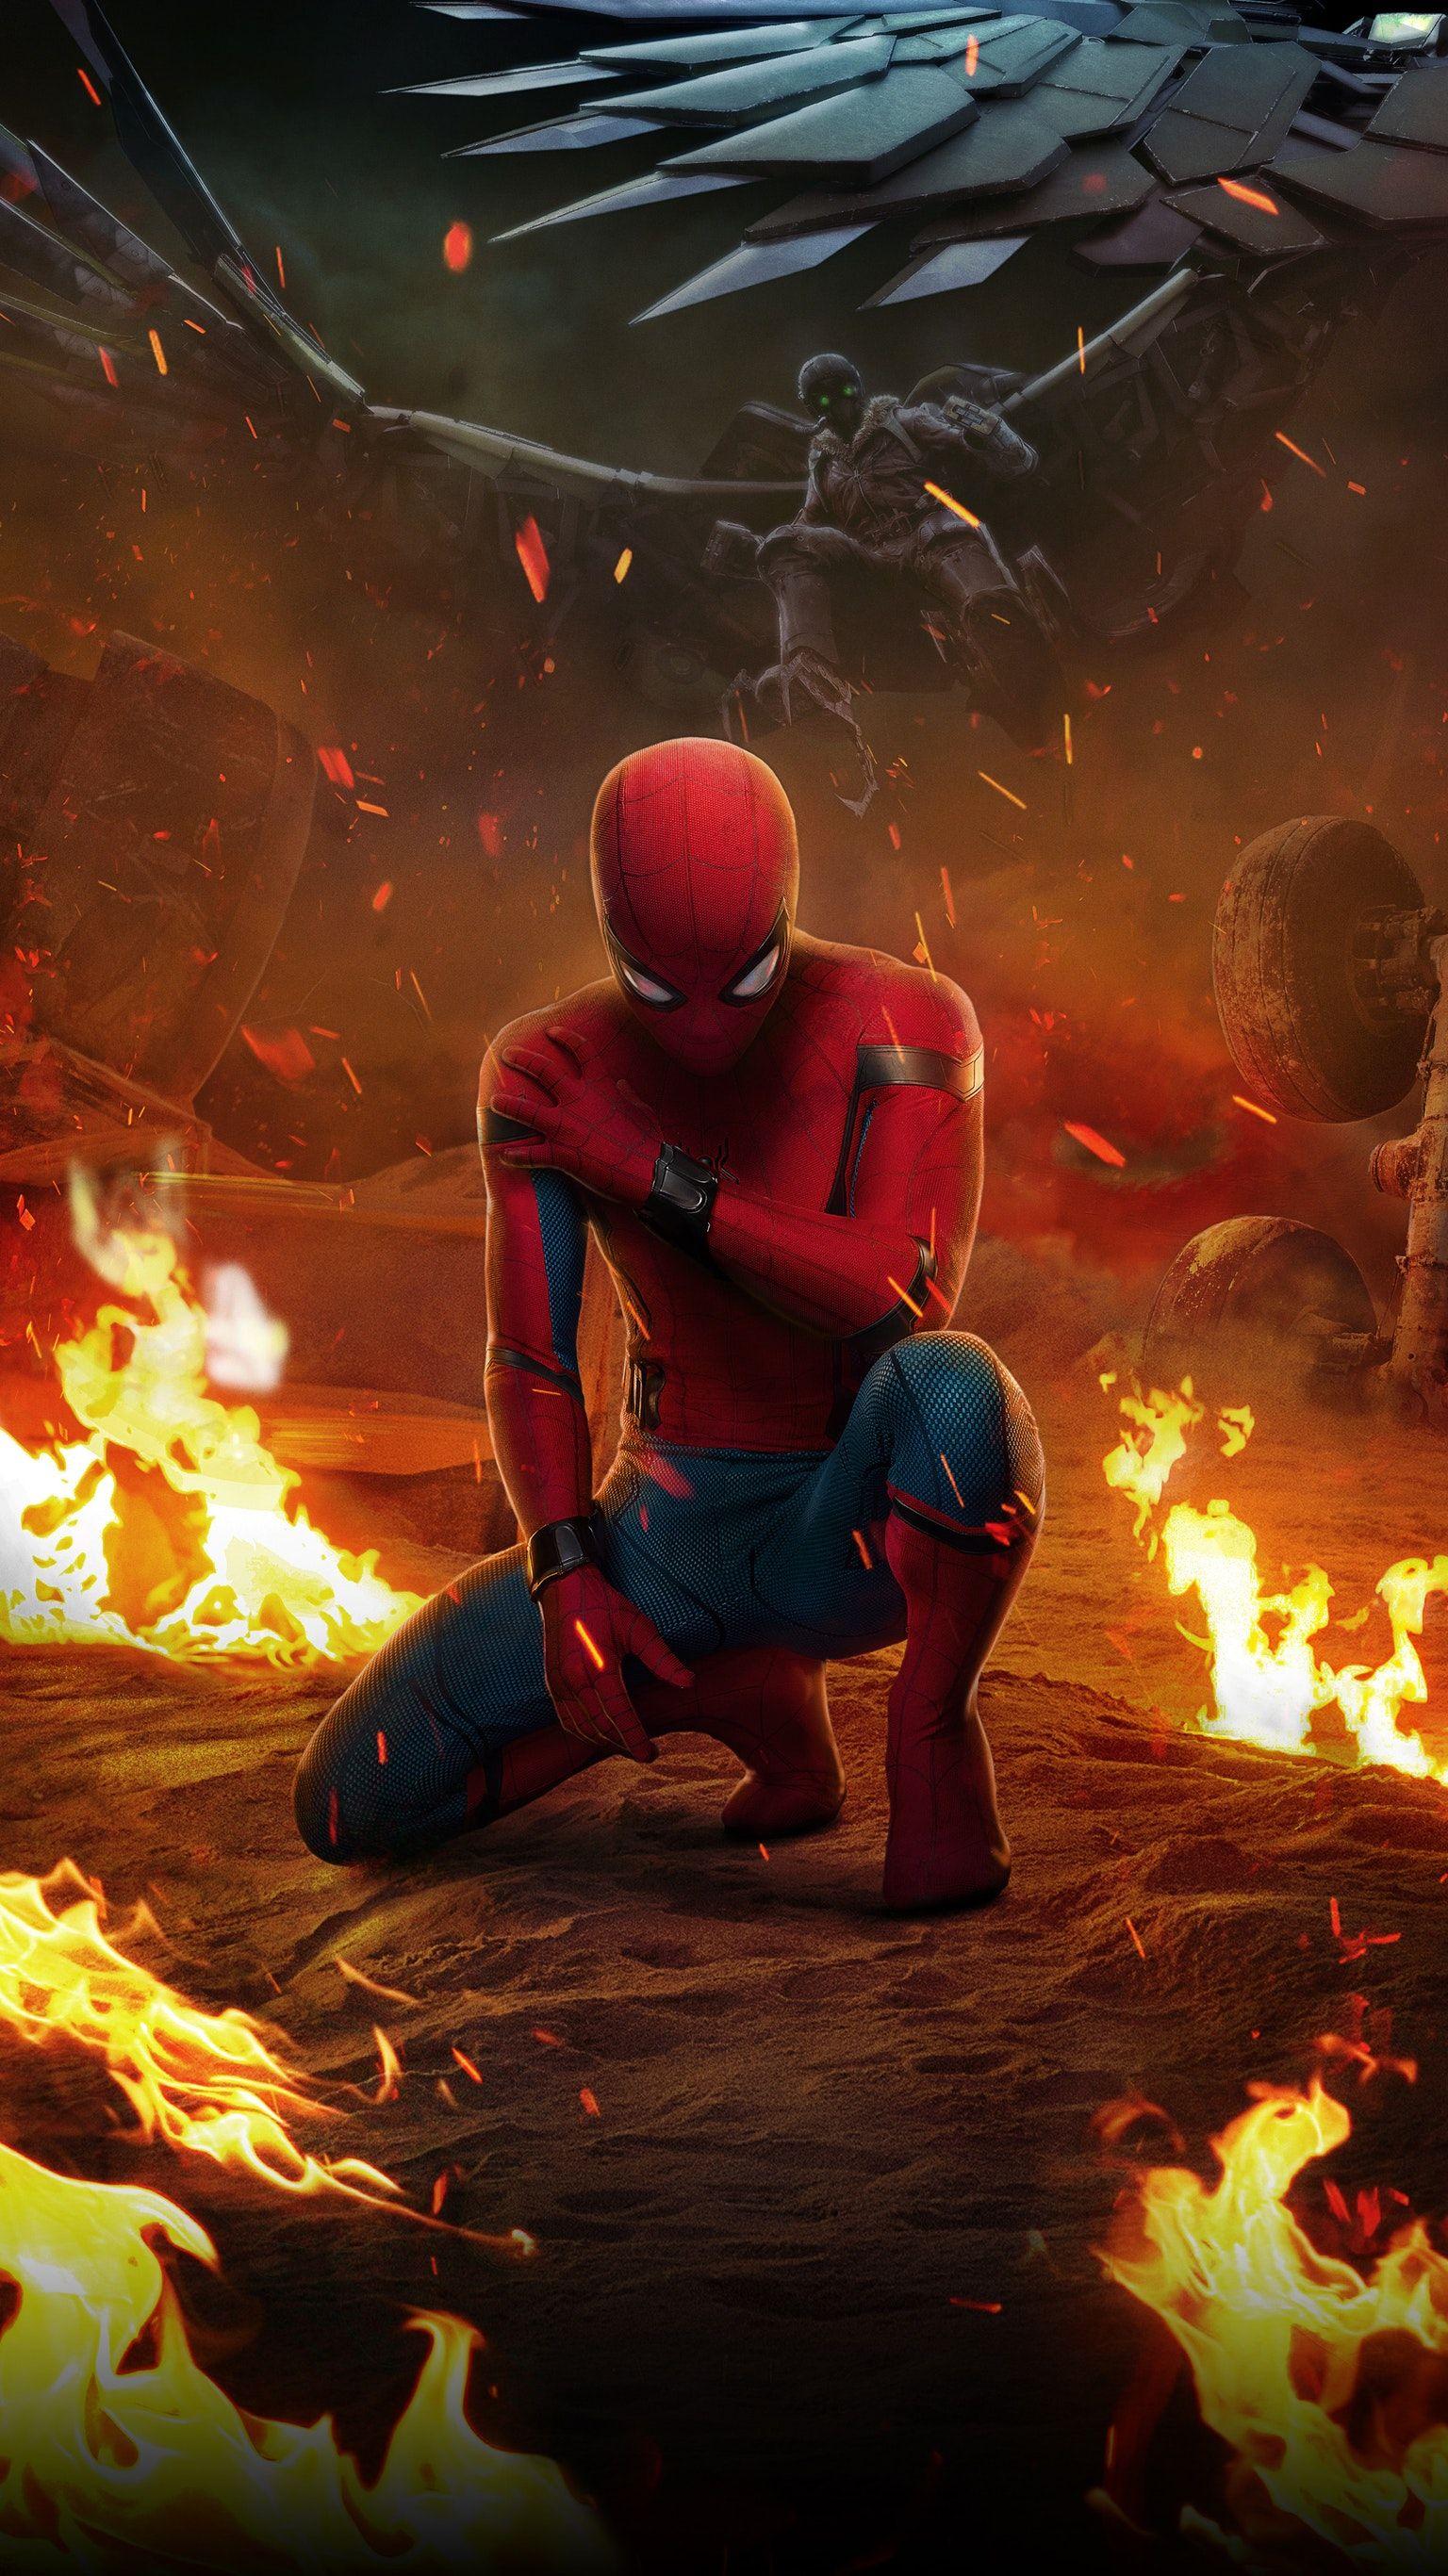 Spider Man Homecoming 2017 Phone Wallpaper HERO CIVIL 1536x2733